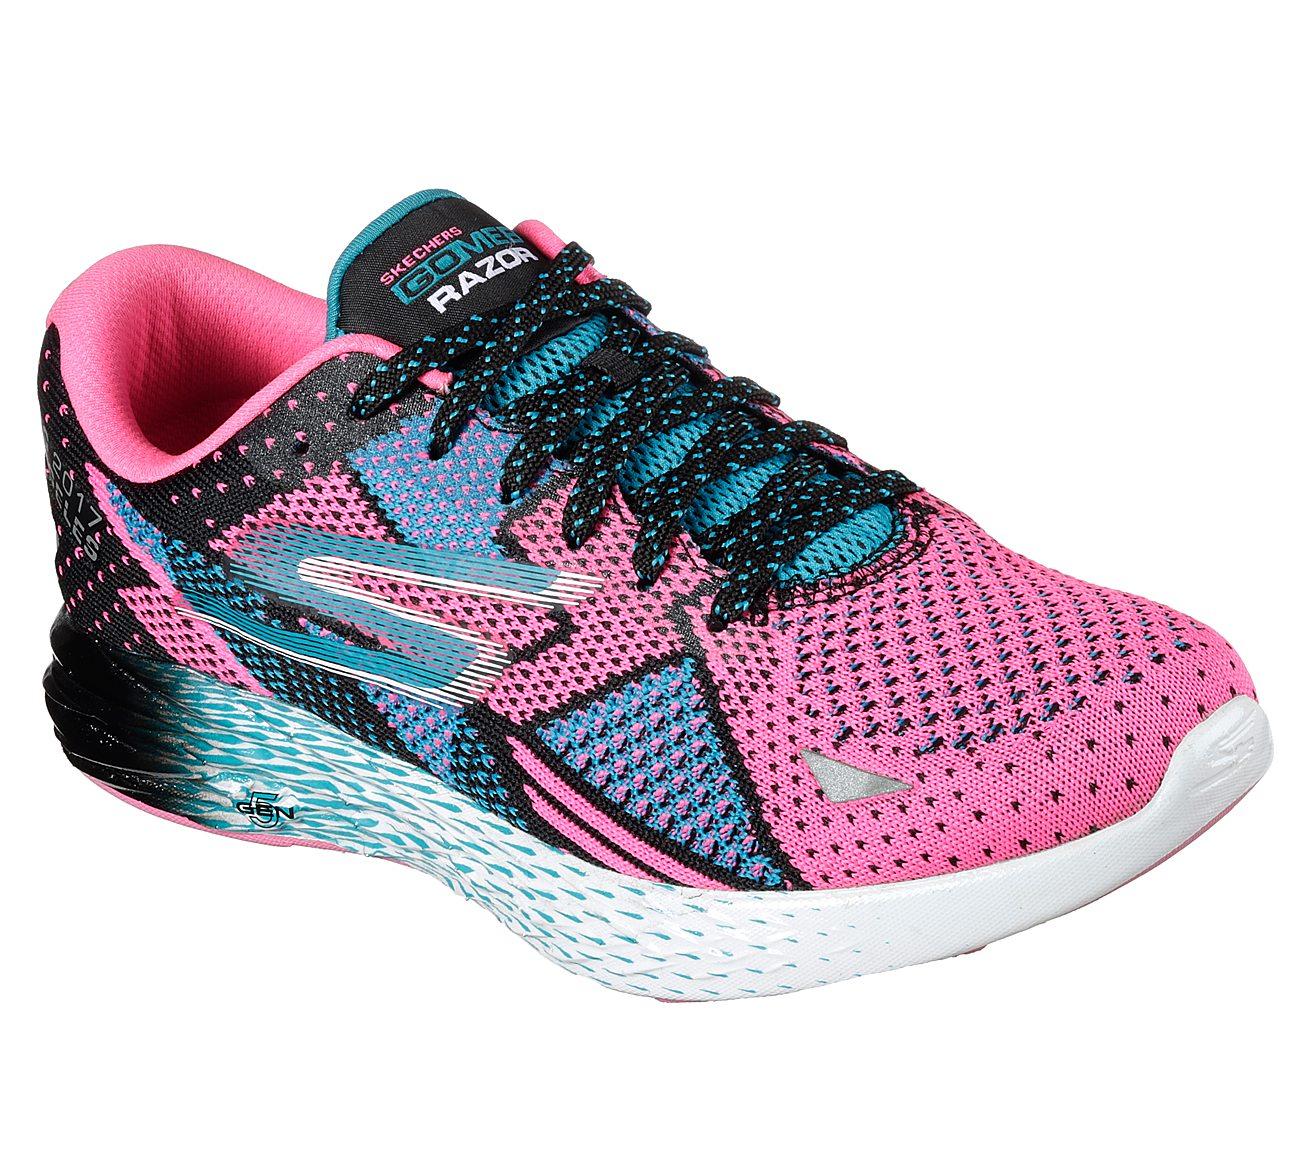 Skechers Women's GoMeb Razor Run Shoe